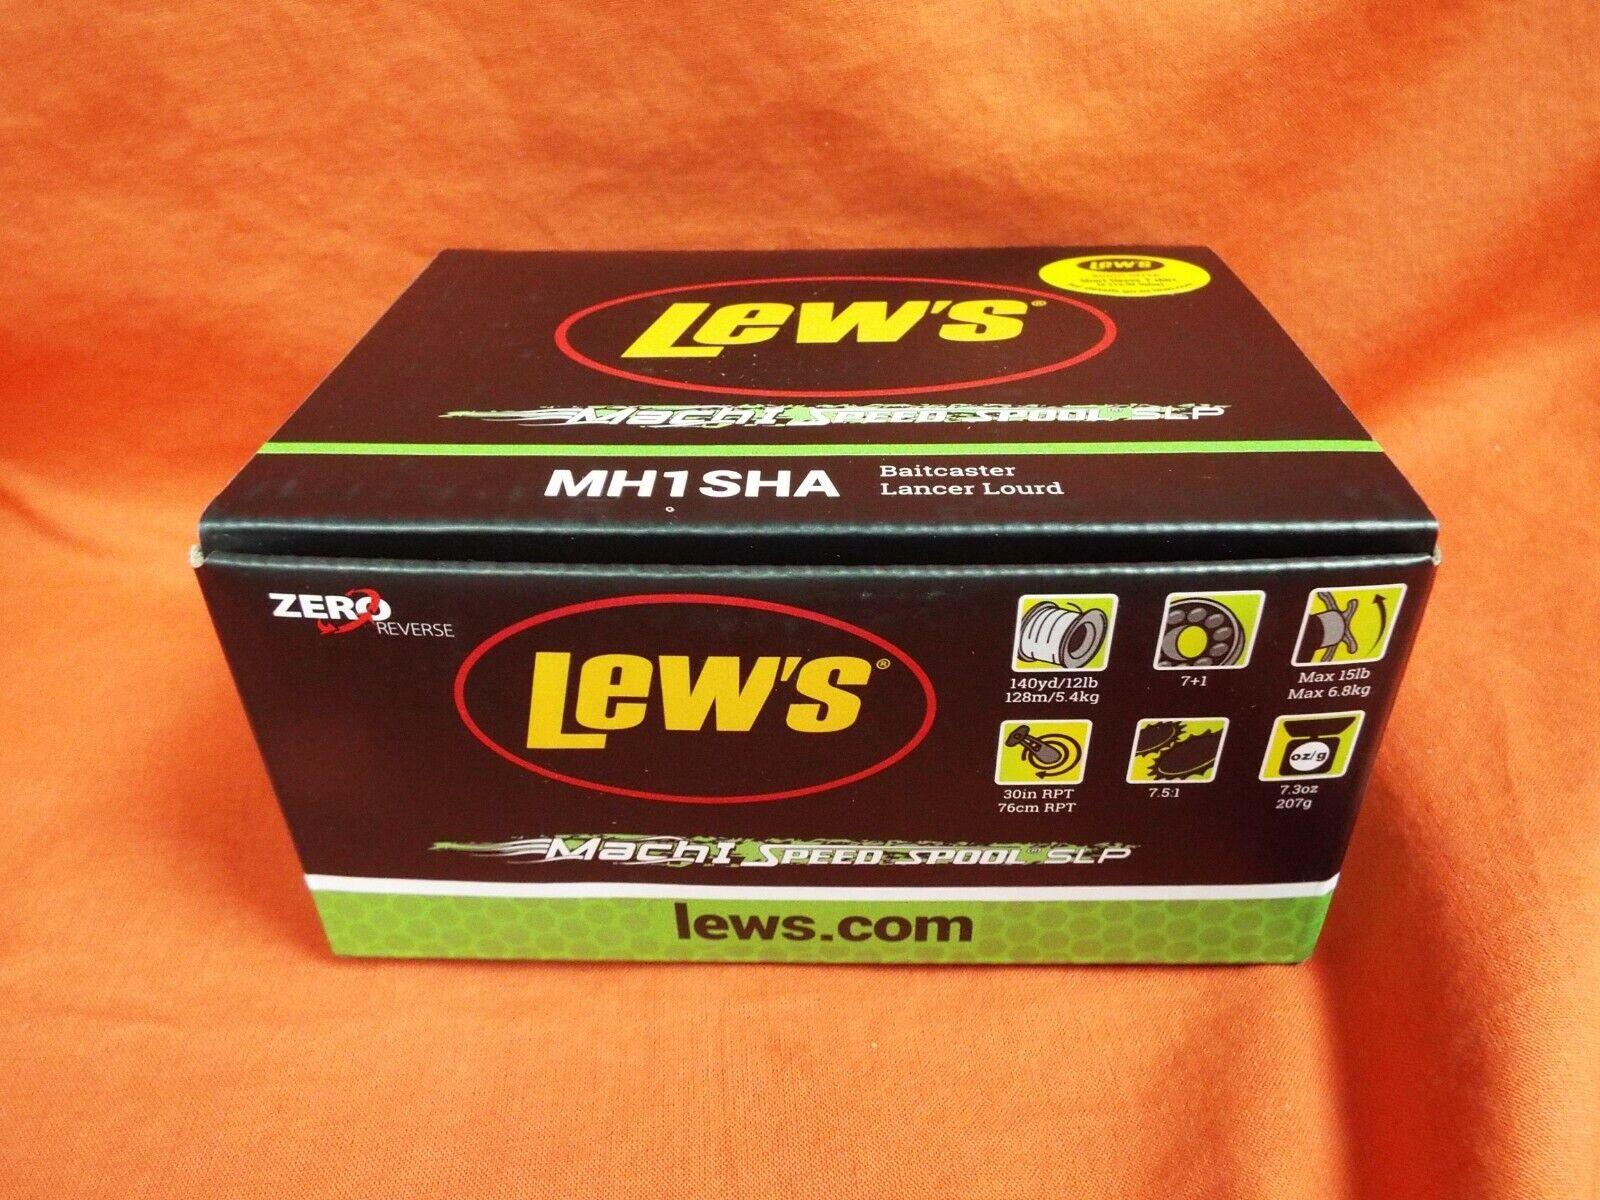 LEW'S Mach I Speed Spool SLP Baitcaster Reel Gear Ratio 7.5 1 MH1SHA